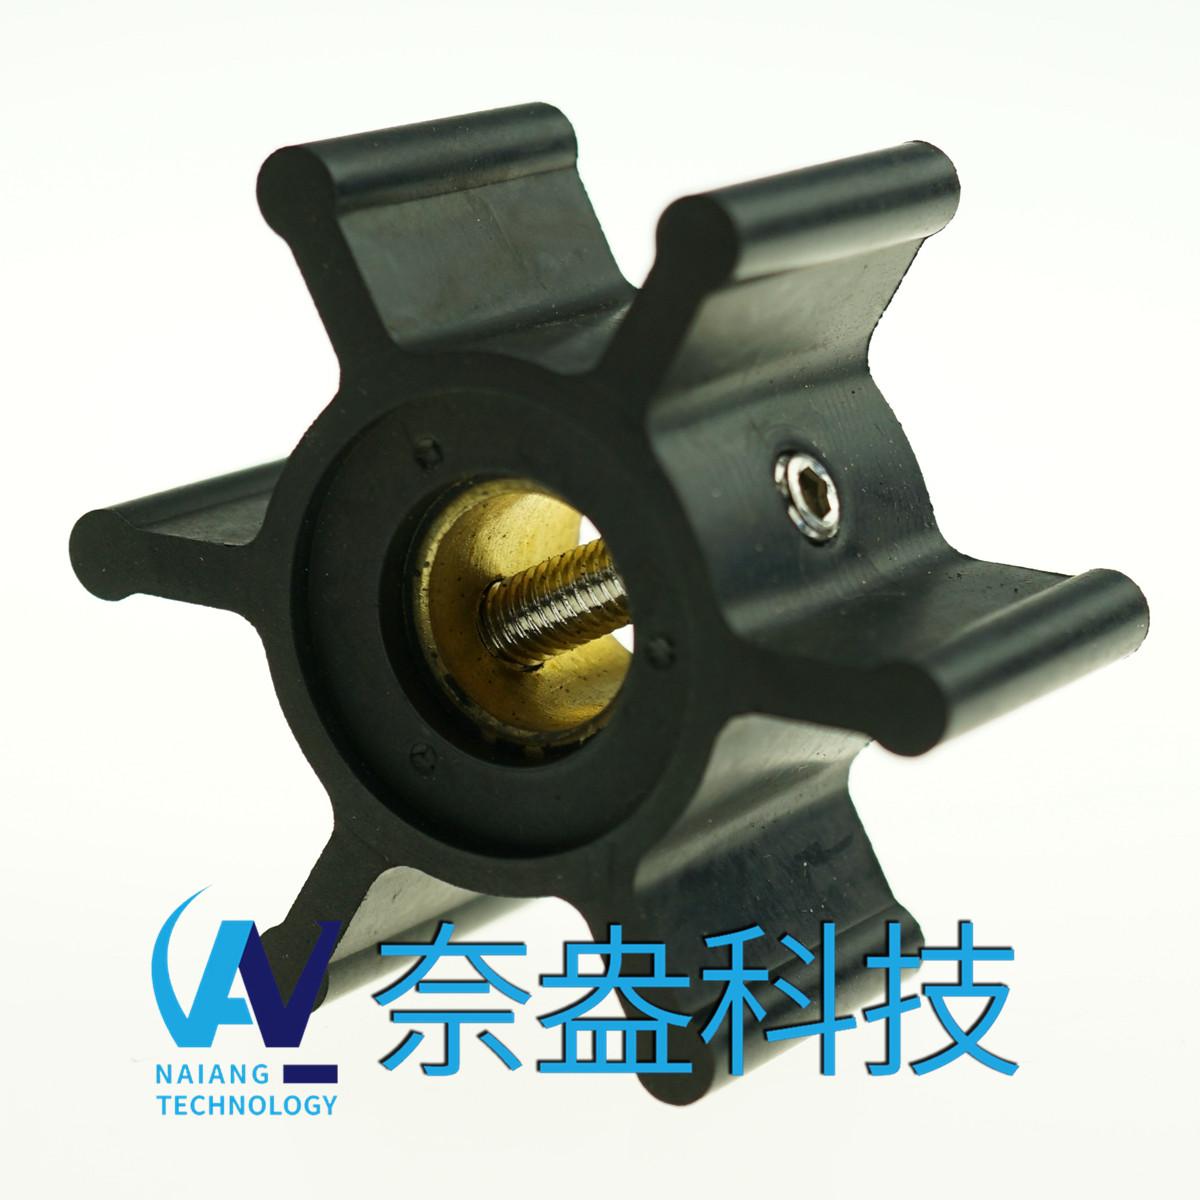 CEF泵用橡胶叶轮 CEF Impeller 500101柔性泵用叶轮